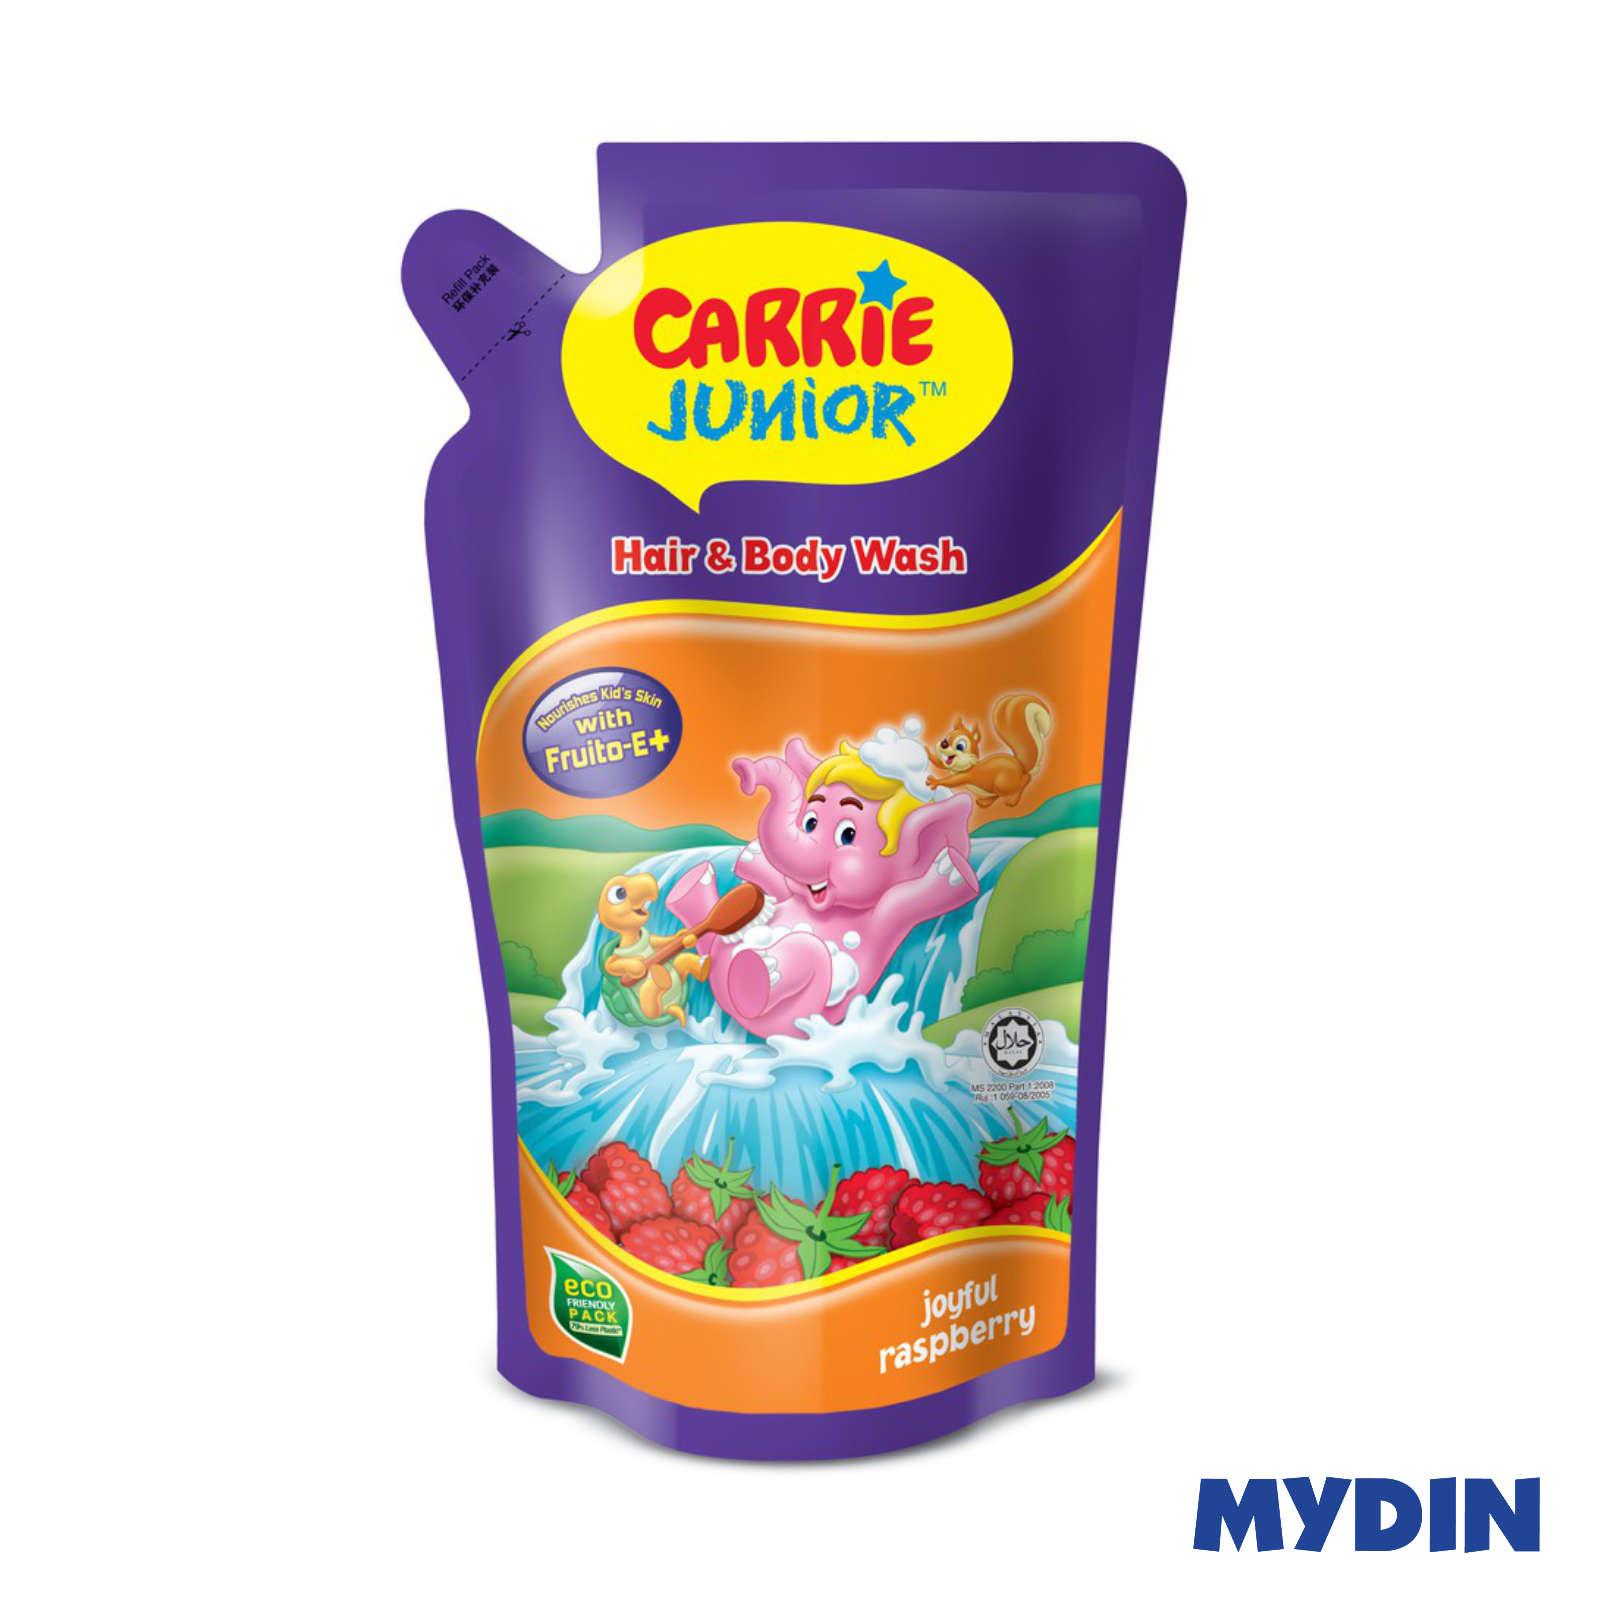 Carrie Junior Hair & Body Wash Raspberry 500g